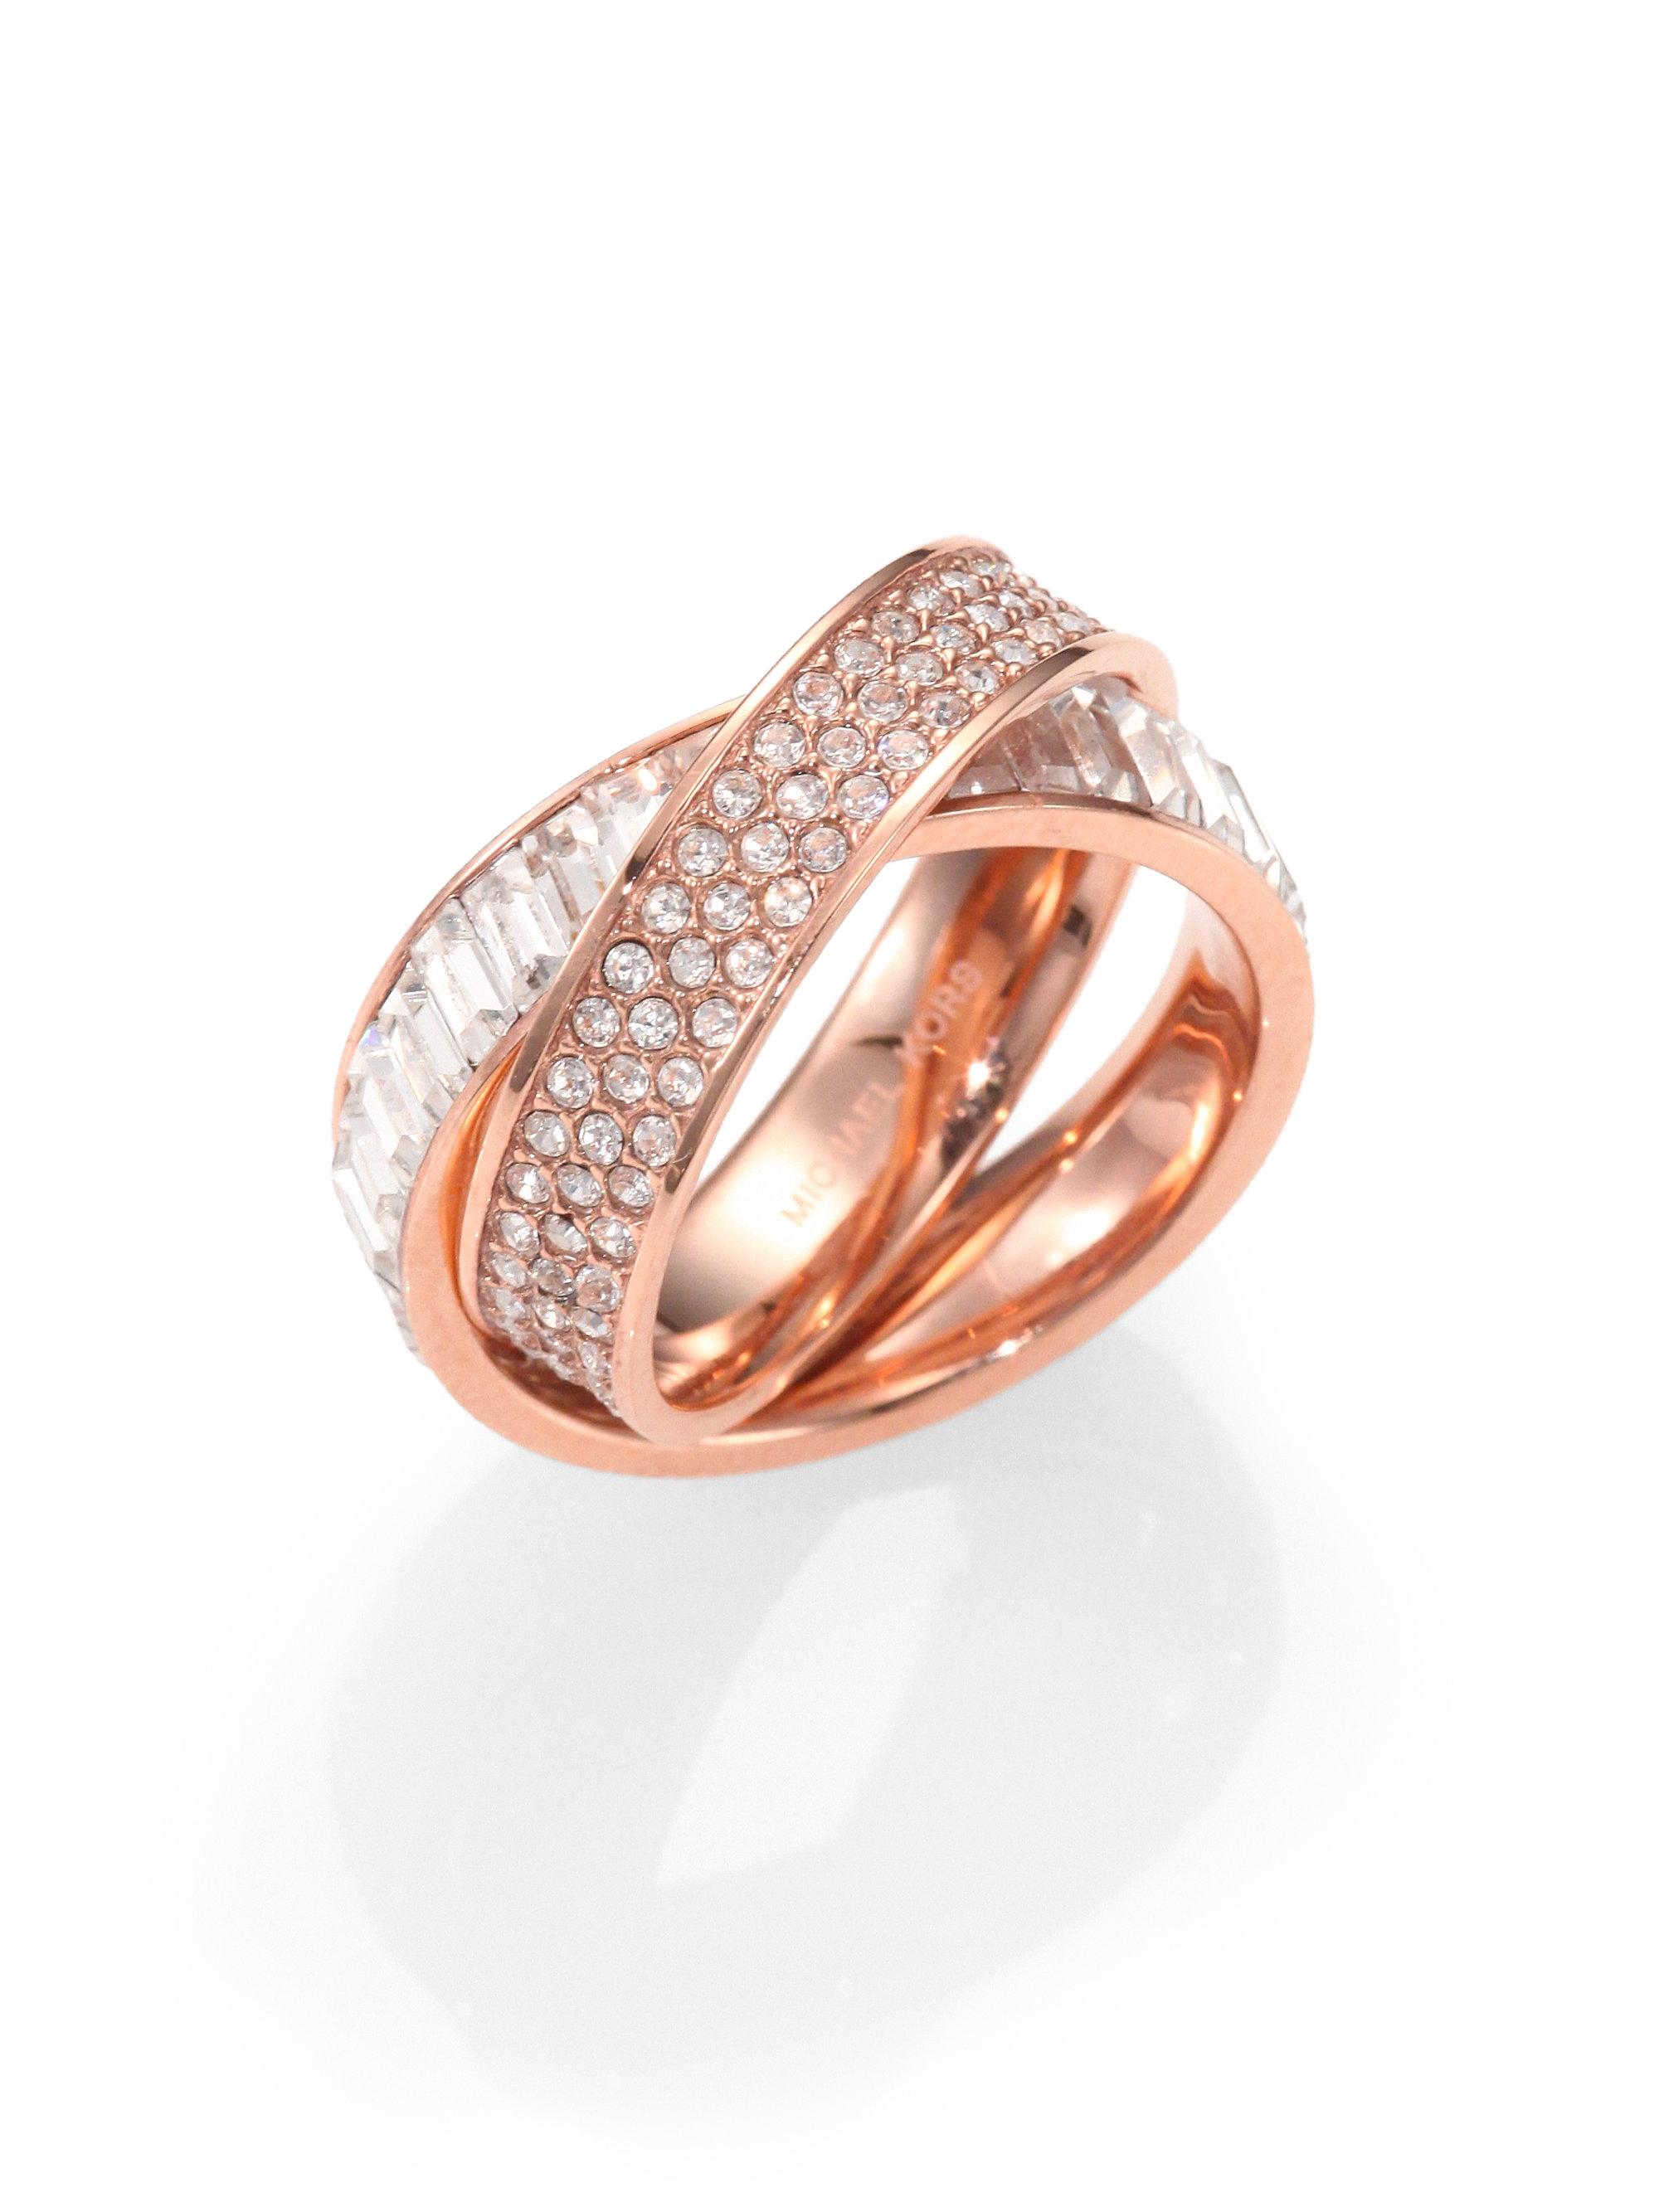 Michael Kors Intertwined Baguette Amp Pav 233 Ring Rose Gold In